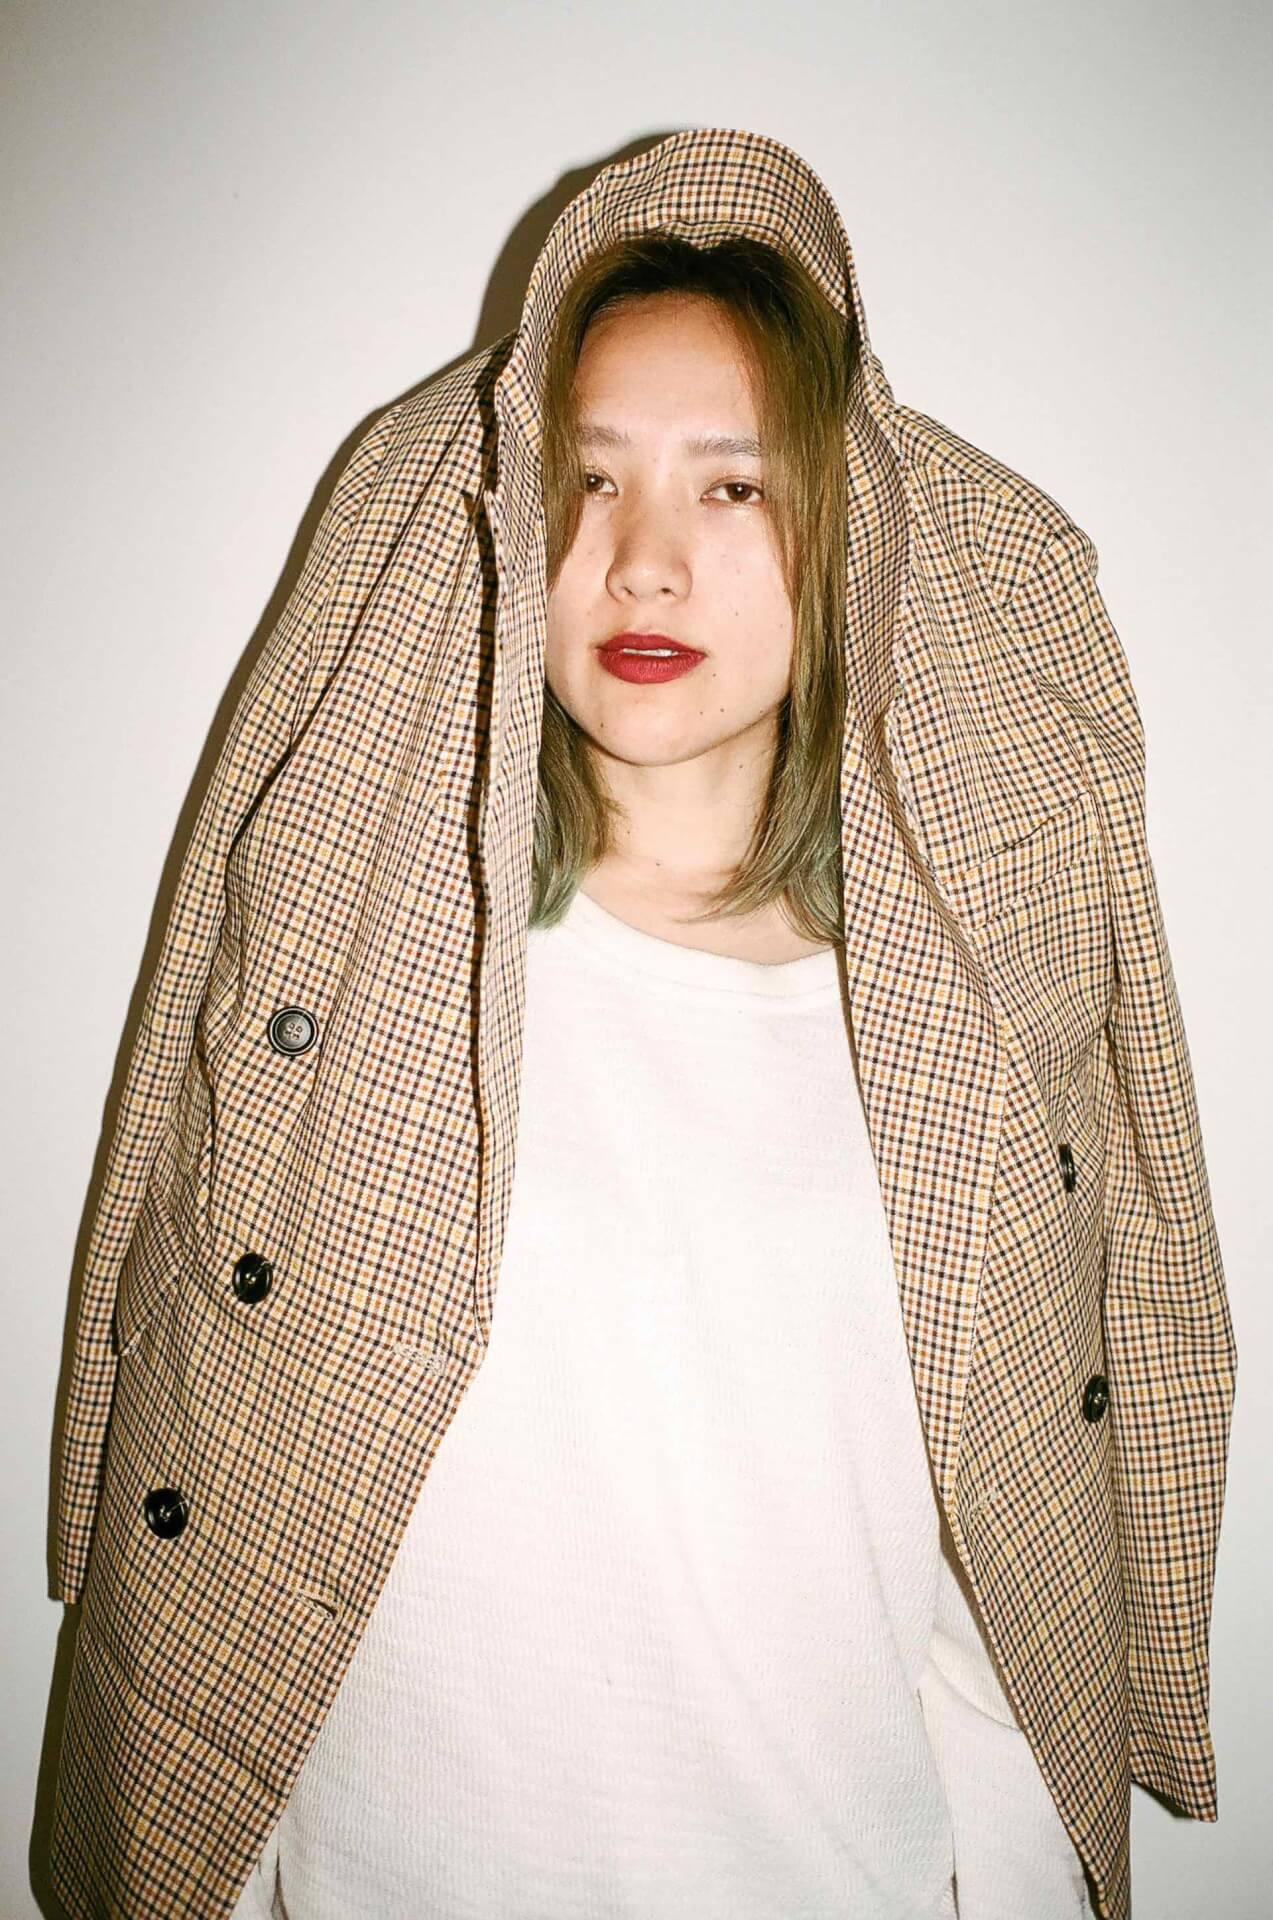 "Shin Sakiura""このまま夢で  feat. AAAMYYY""のHome Session ver.が配信!YouTubeでセッション動画も公開 music200527_aaamyyy_shinsakiura_01"